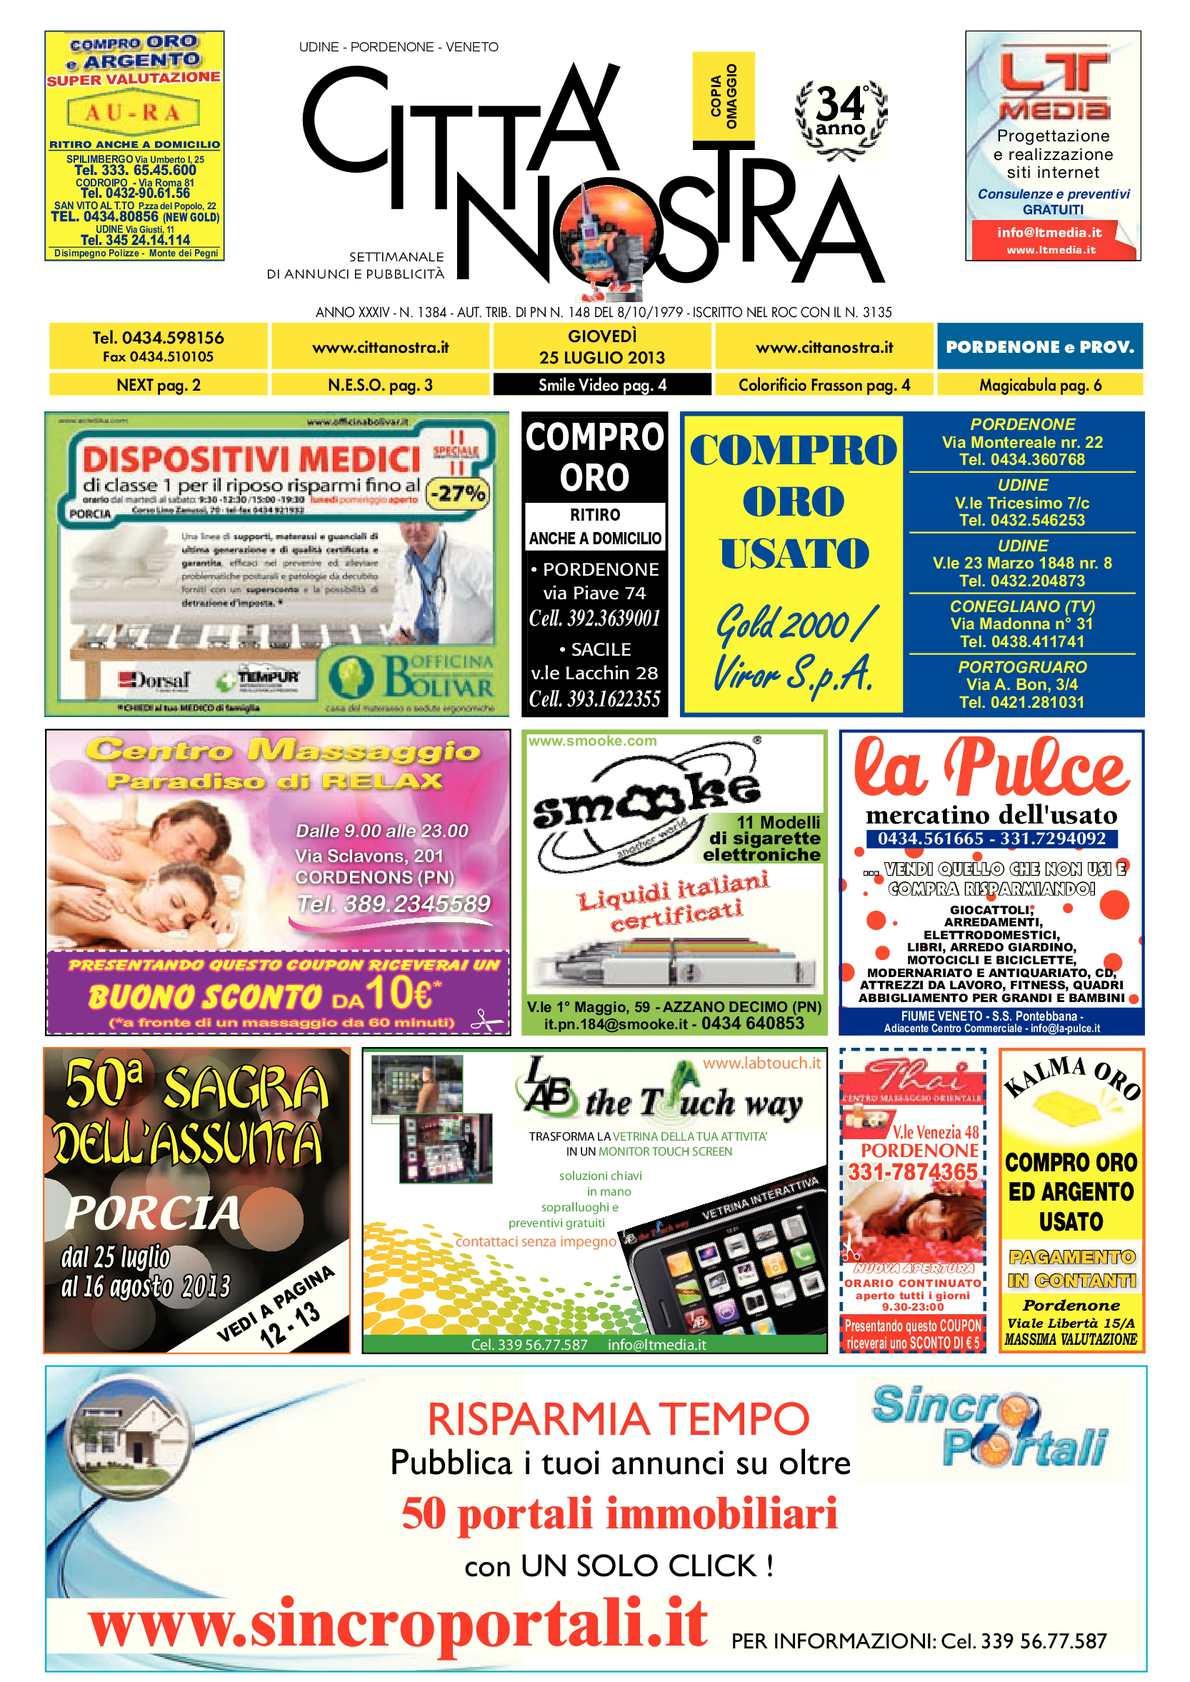 Calaméo - Città Nostra Pordenone del 25.07.2013 n. 1384 044d8b1b9db1